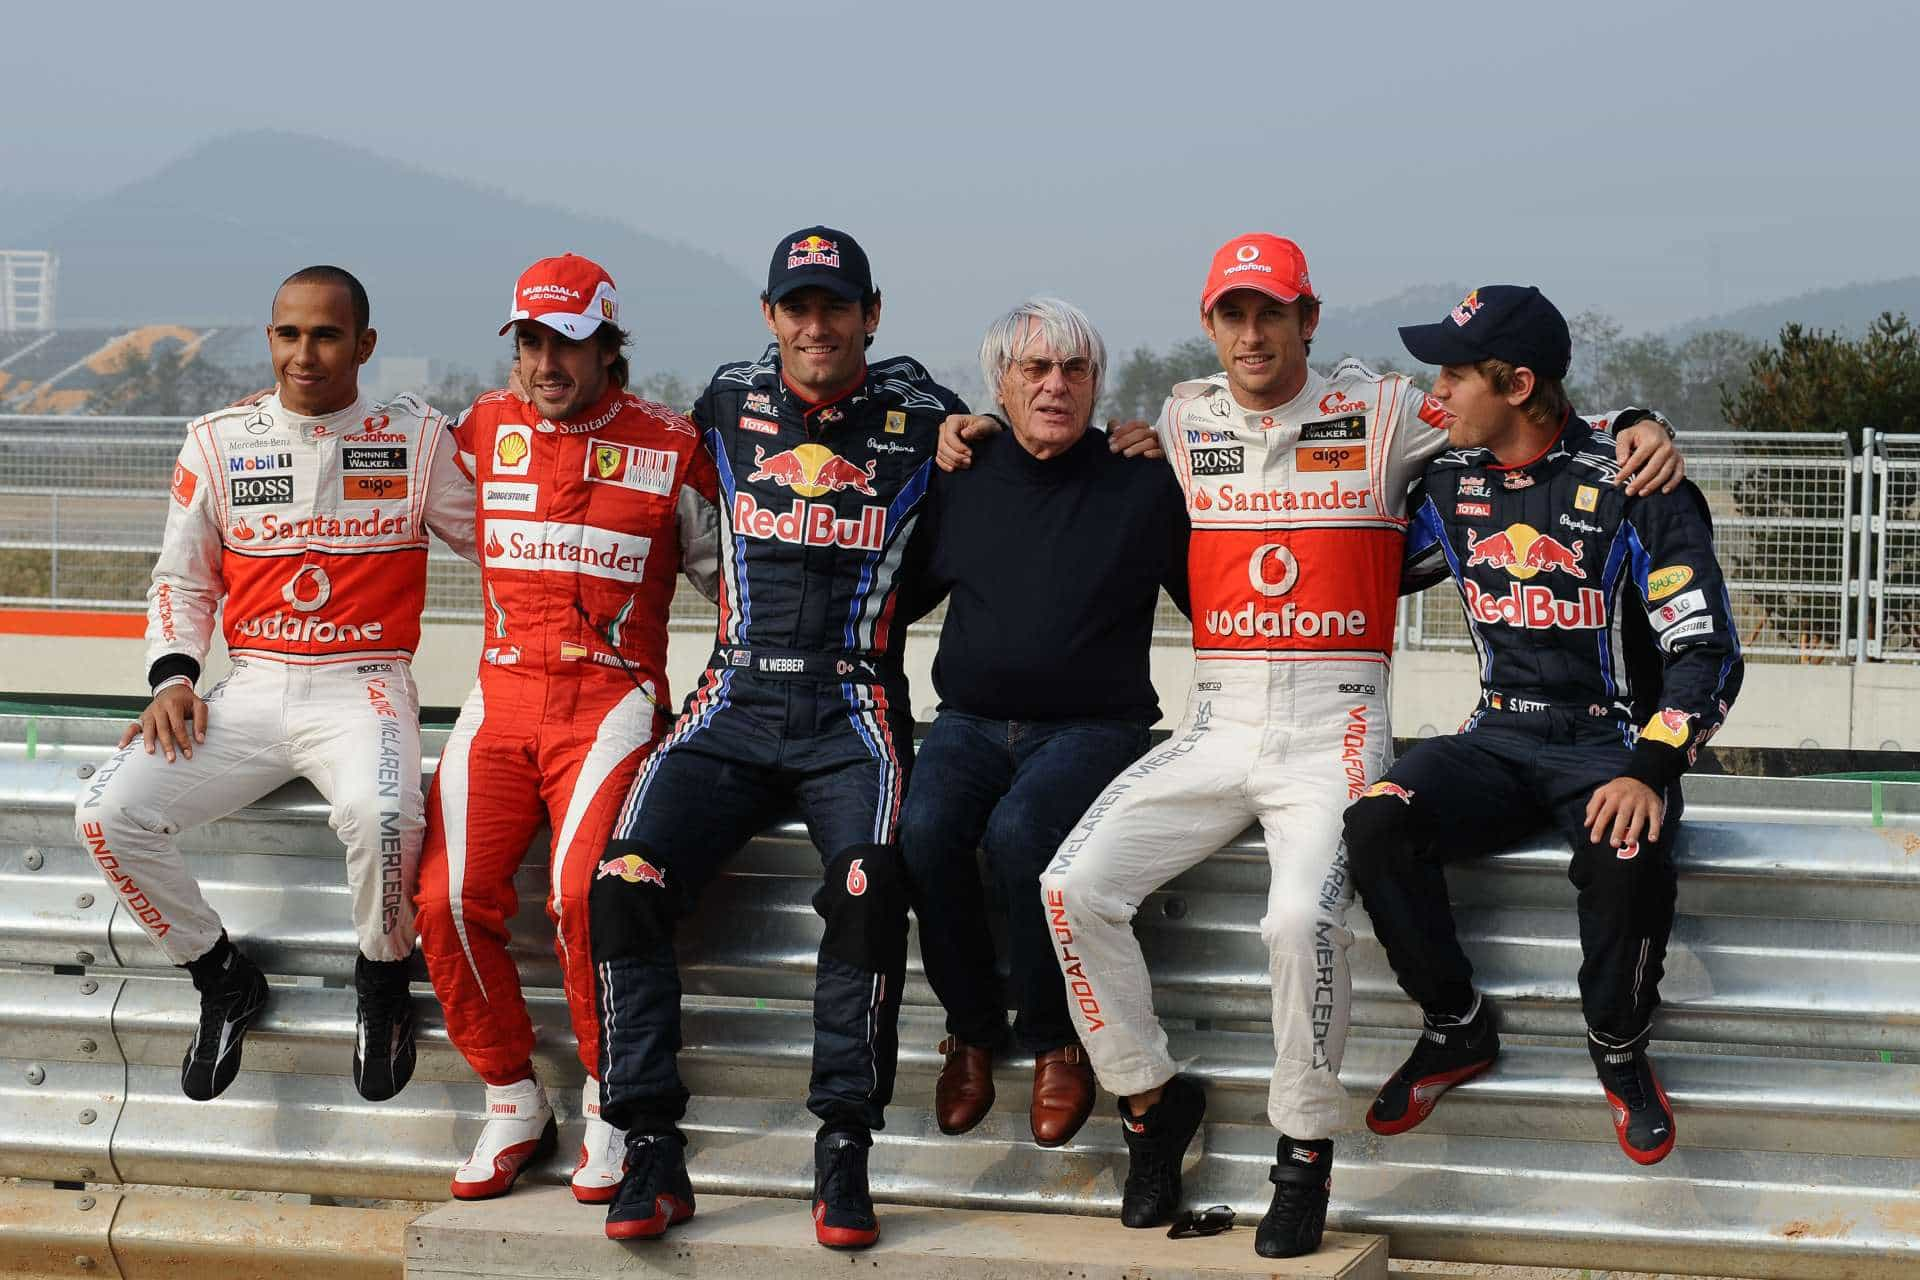 Korean GP F1 2010 Hamilton Alonso Webber Ecclestone Button Vettel Photo Ferrari